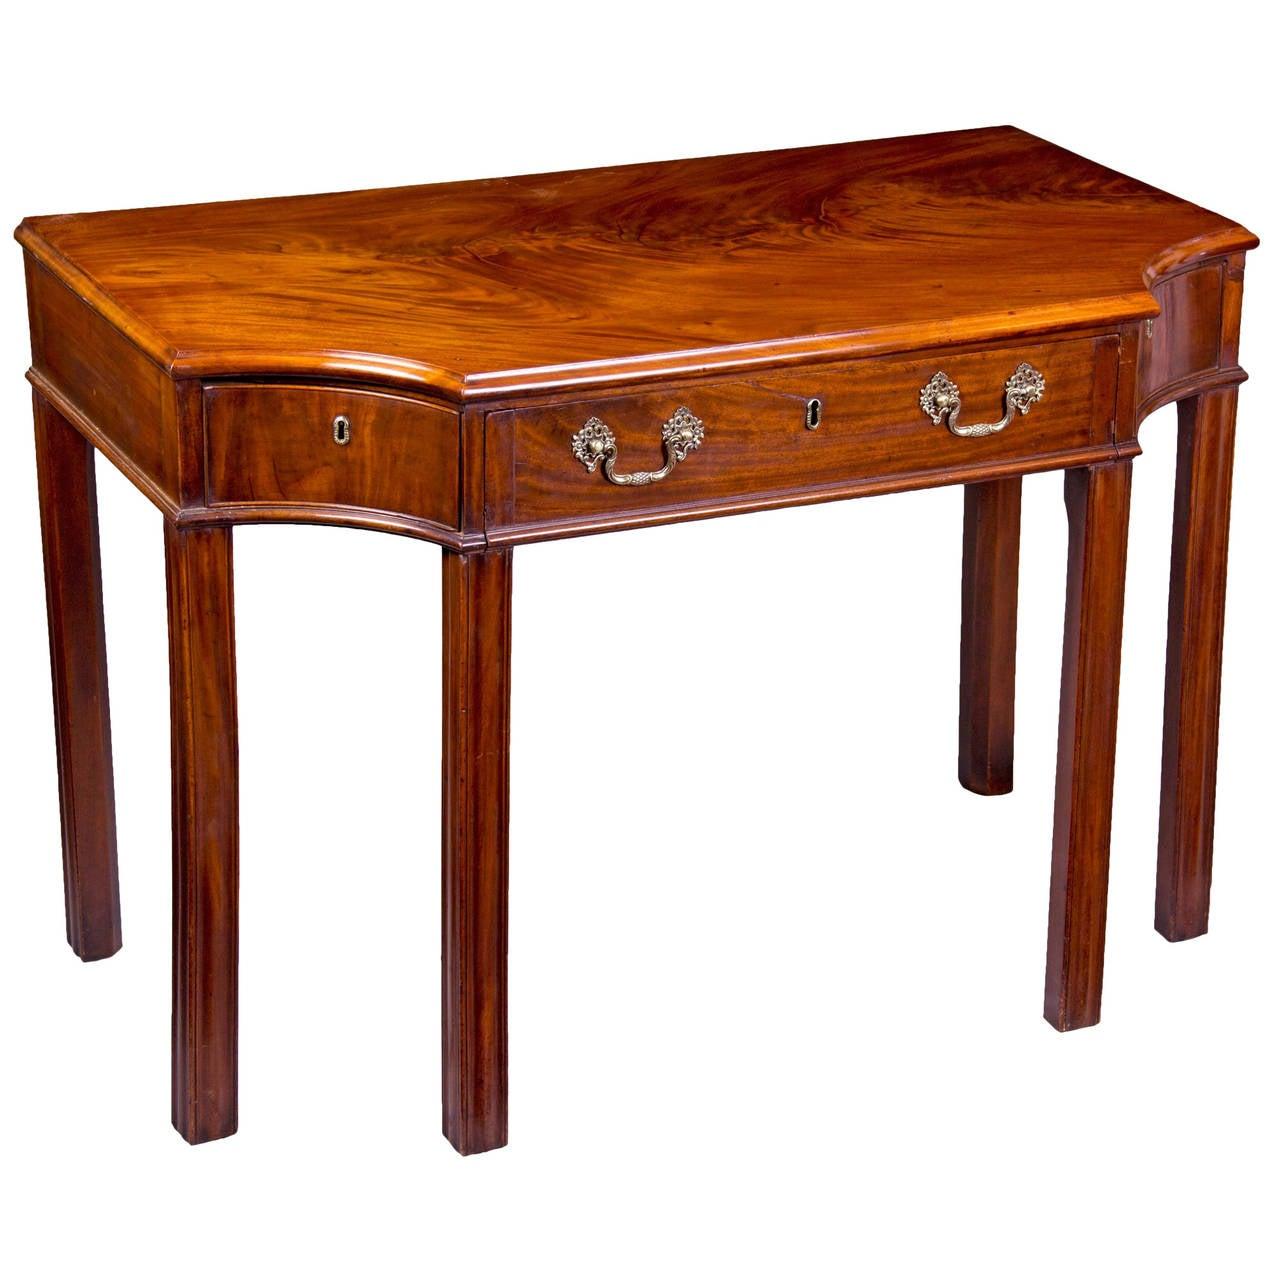 Mahogany george iii console table telescopic reading table mahogany george iii console table telescopic reading table circa 1790 1 geotapseo Gallery